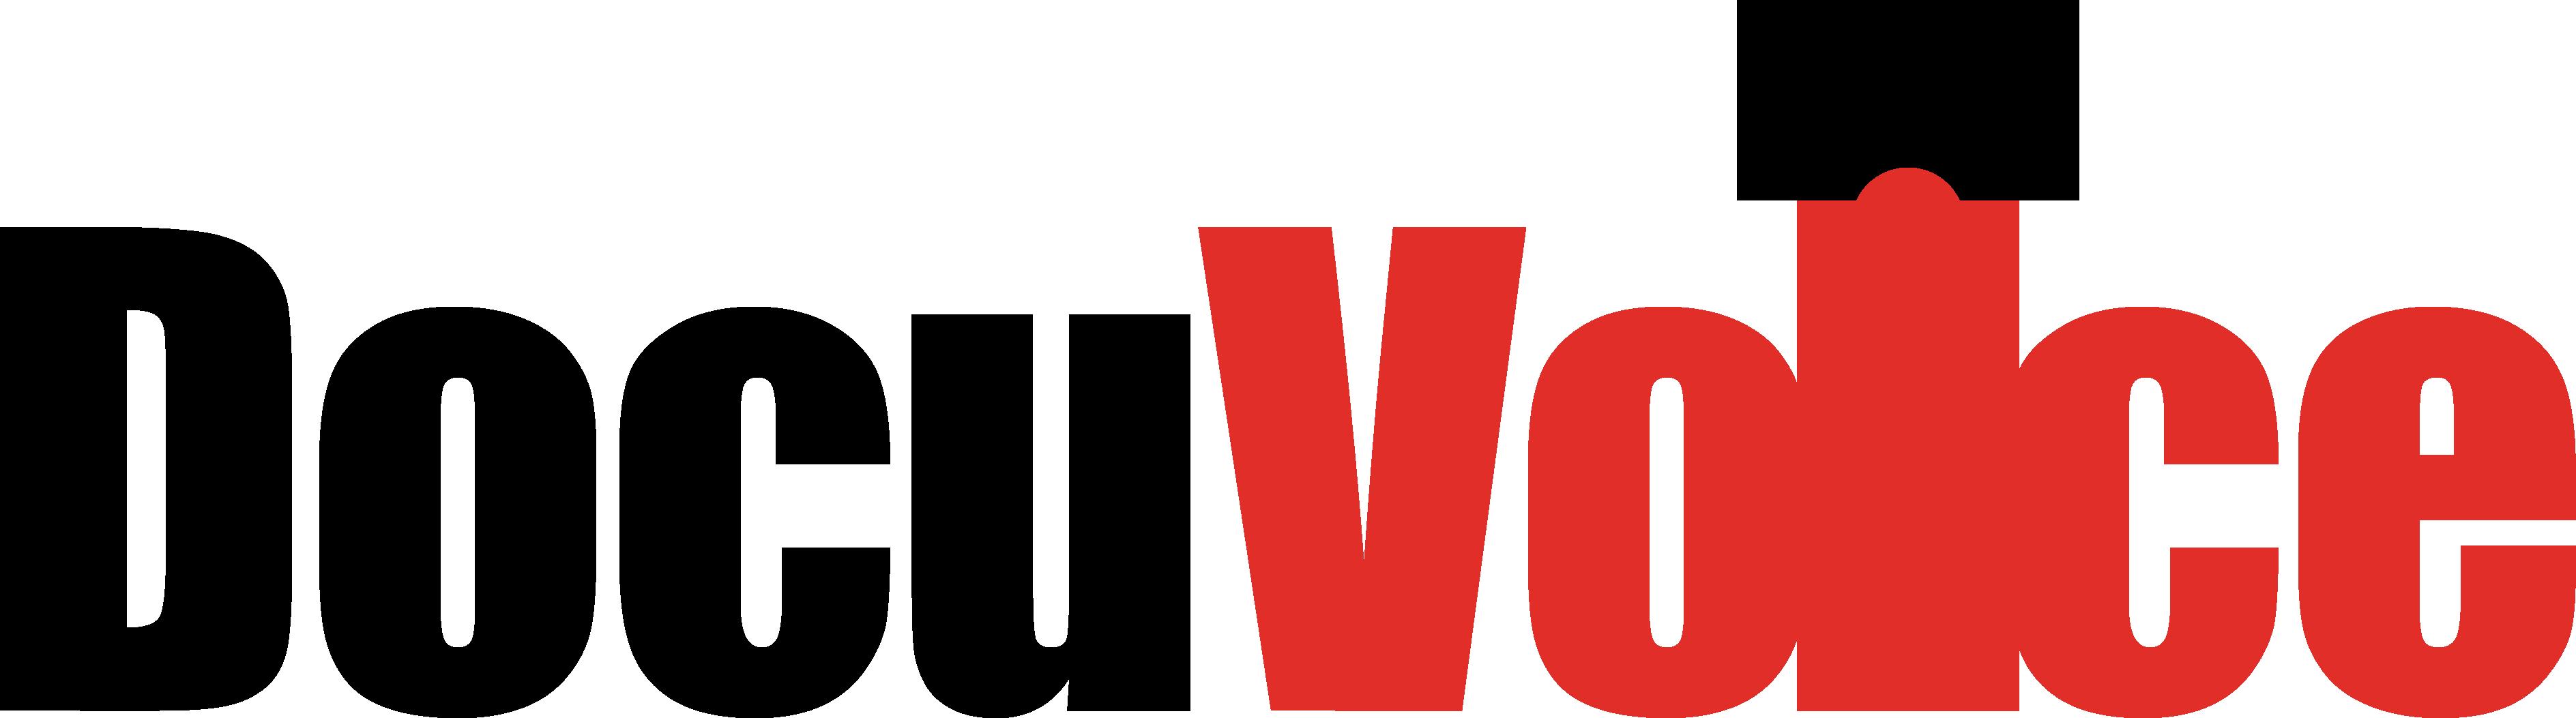 DocuVoice-Logo-black-red